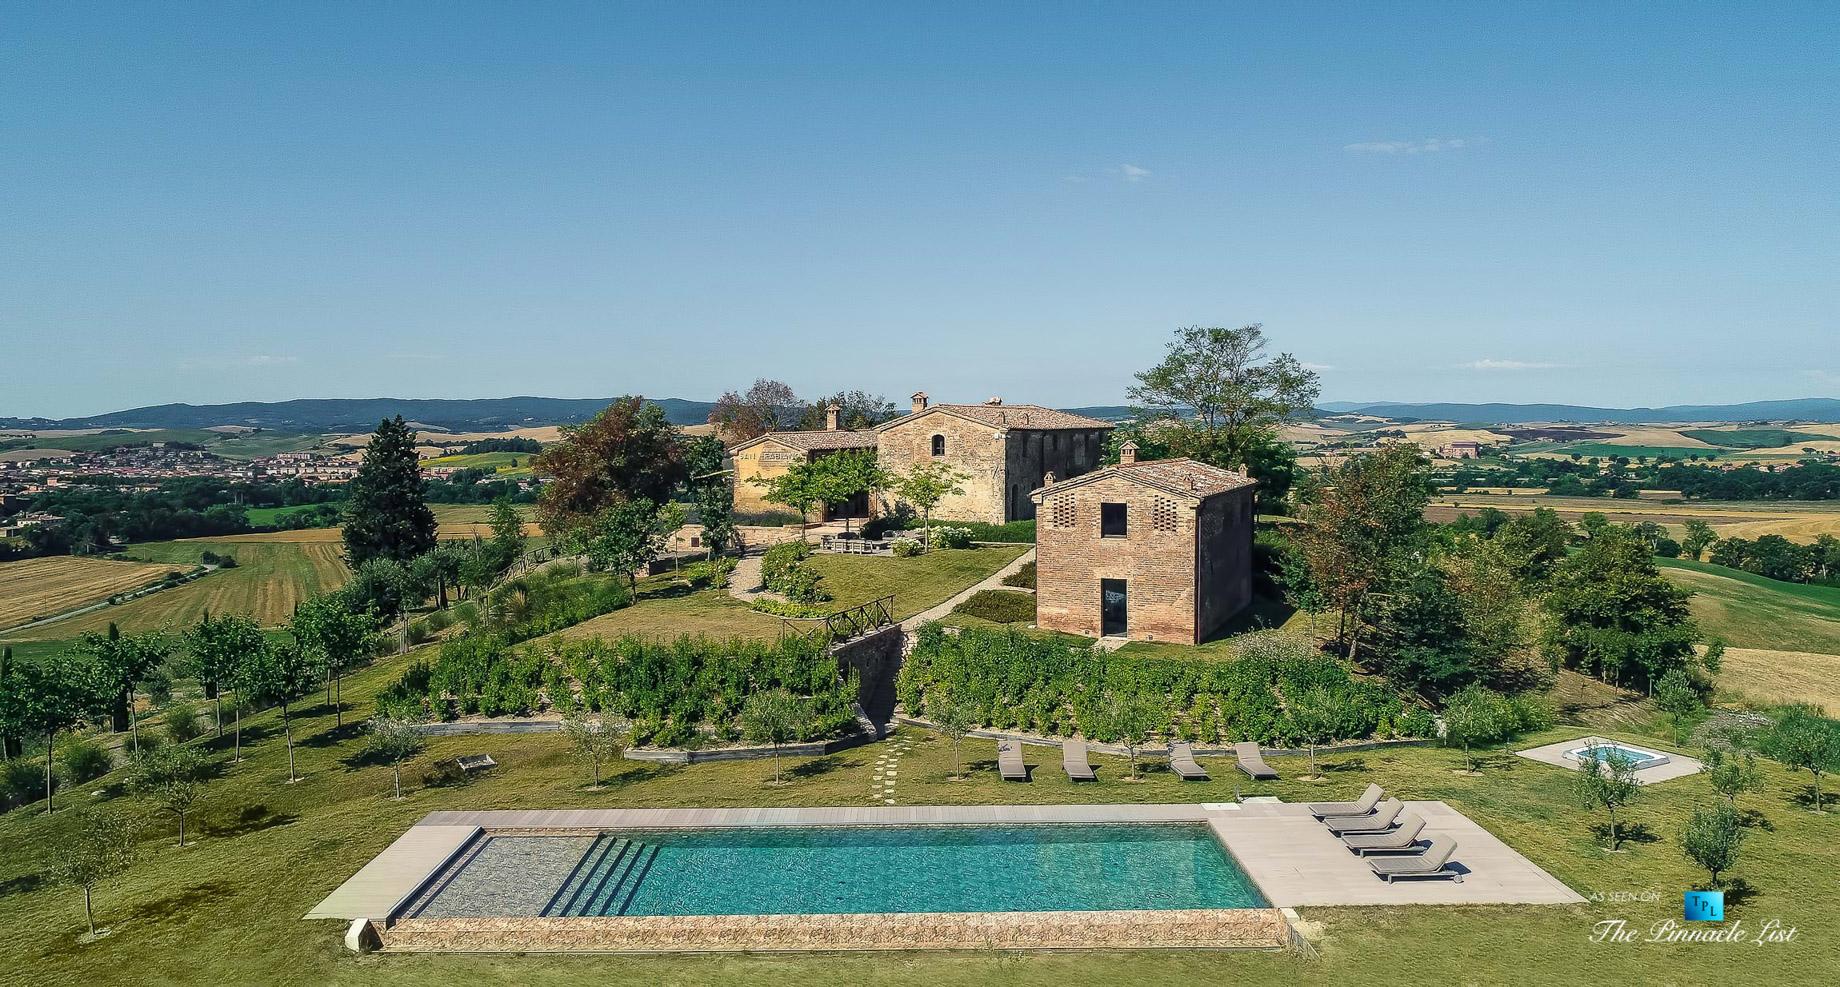 Podere Paníco Estate - Monteroni d'Arbia, Tuscany, Italy - Property Drone Aerial View - Luxury Real Estate - Tuscan Villa